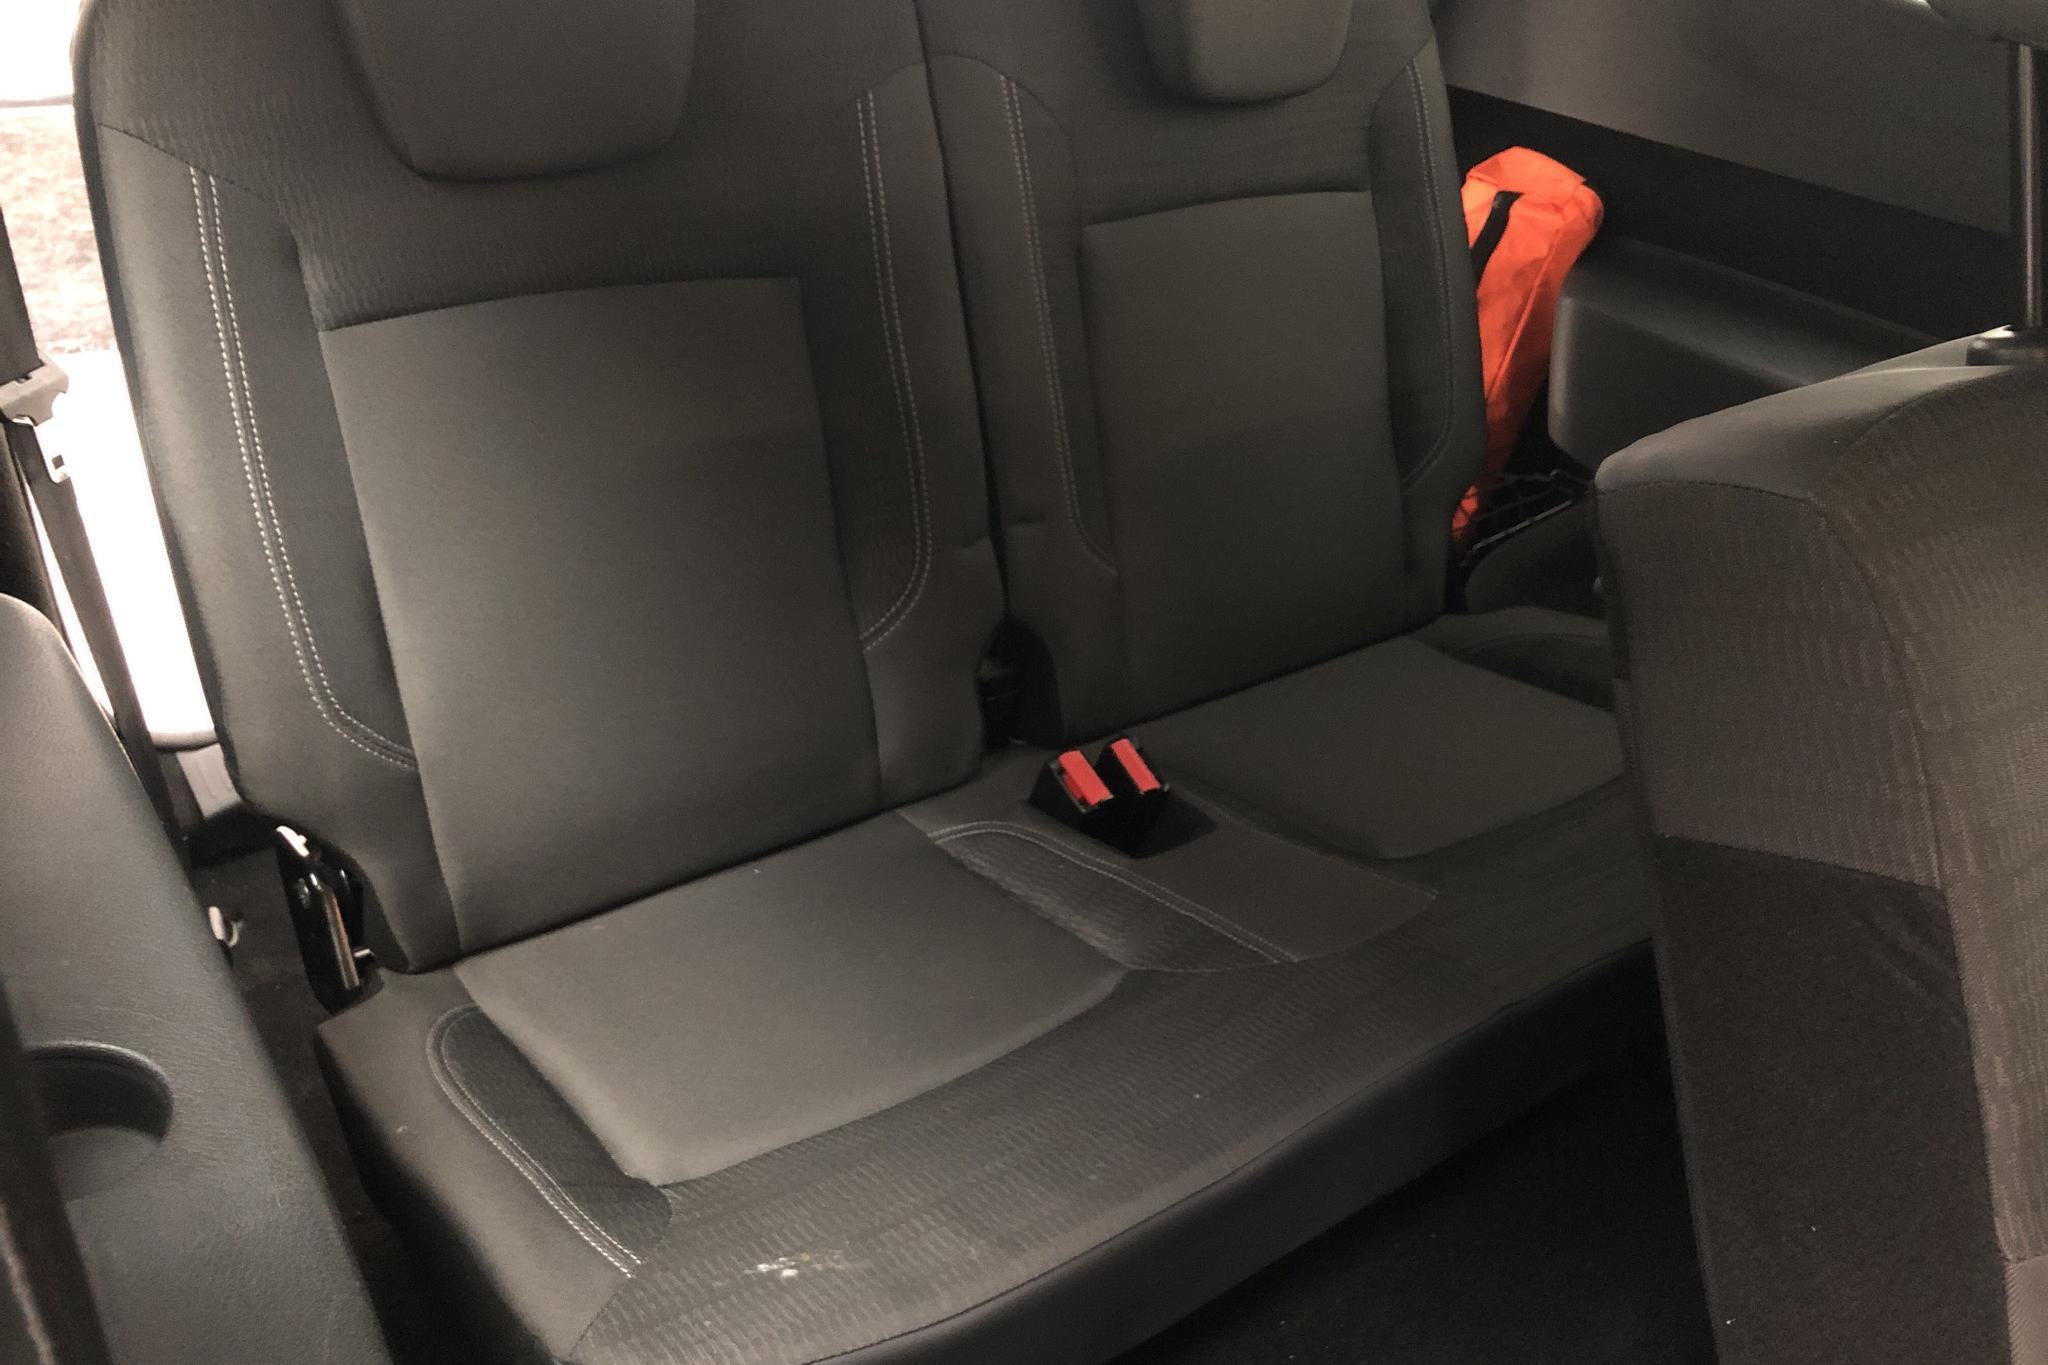 Dacia Lodgy 1.2 TCe (115hk) - 12 373 mil - Manuell - Light Brown - 2013